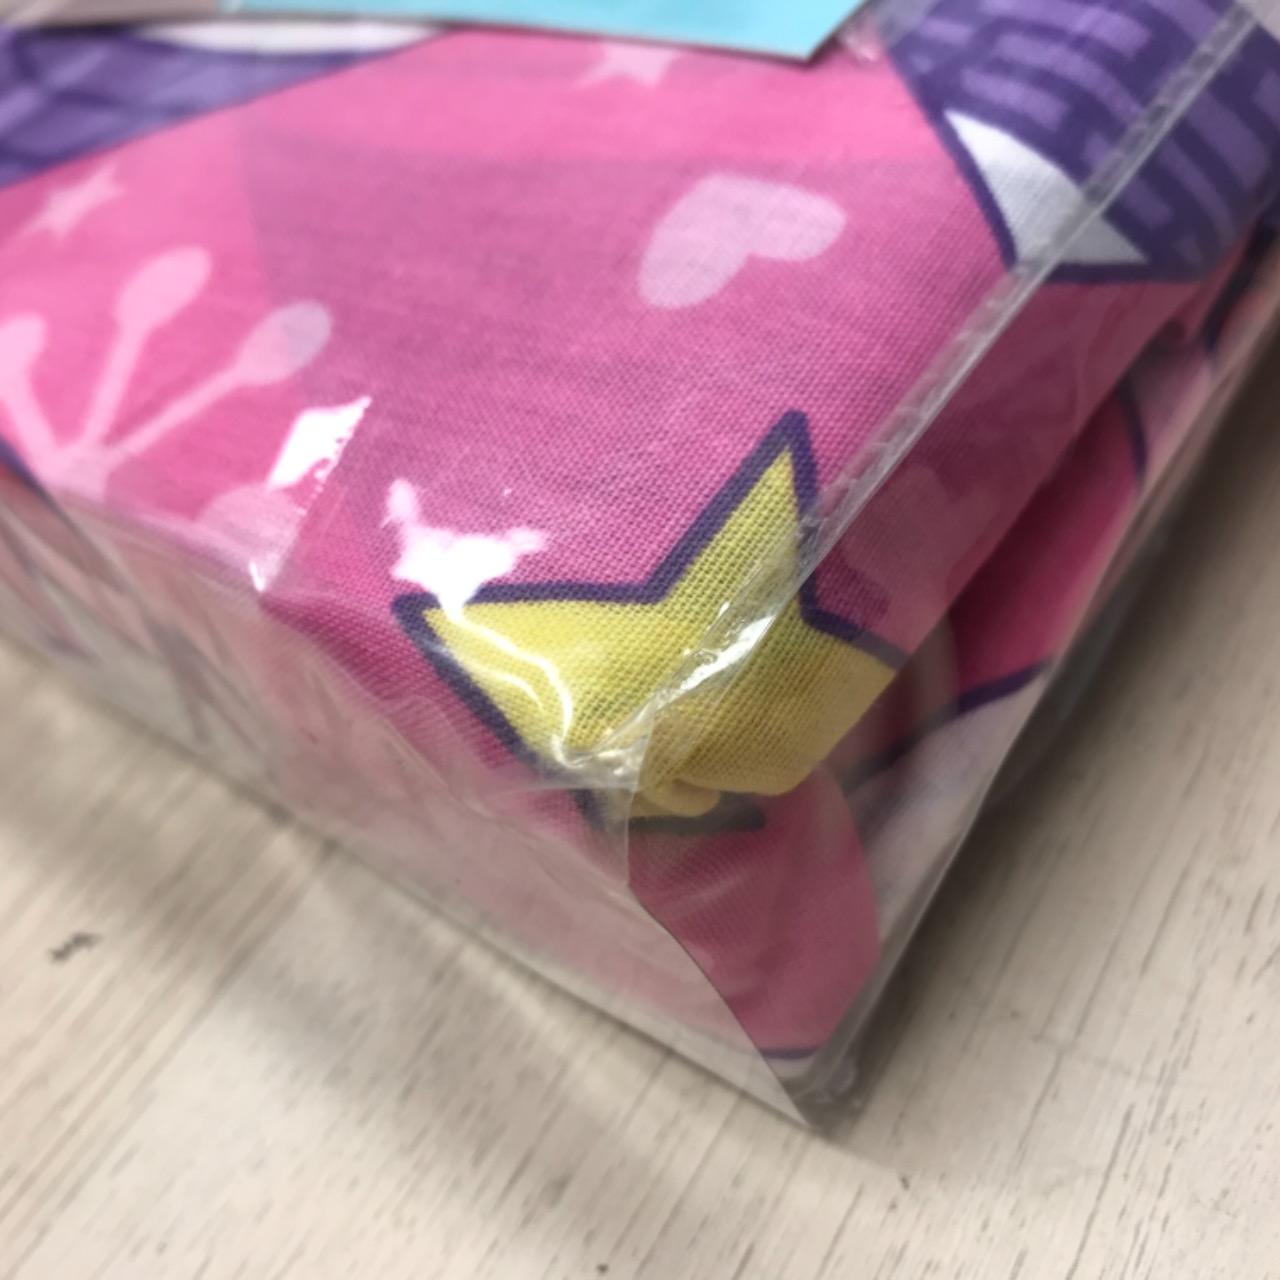 BNWT ROOMATES Pretty Pink SB Printed Quilt Cover Set - Fantasy Unicorn Design